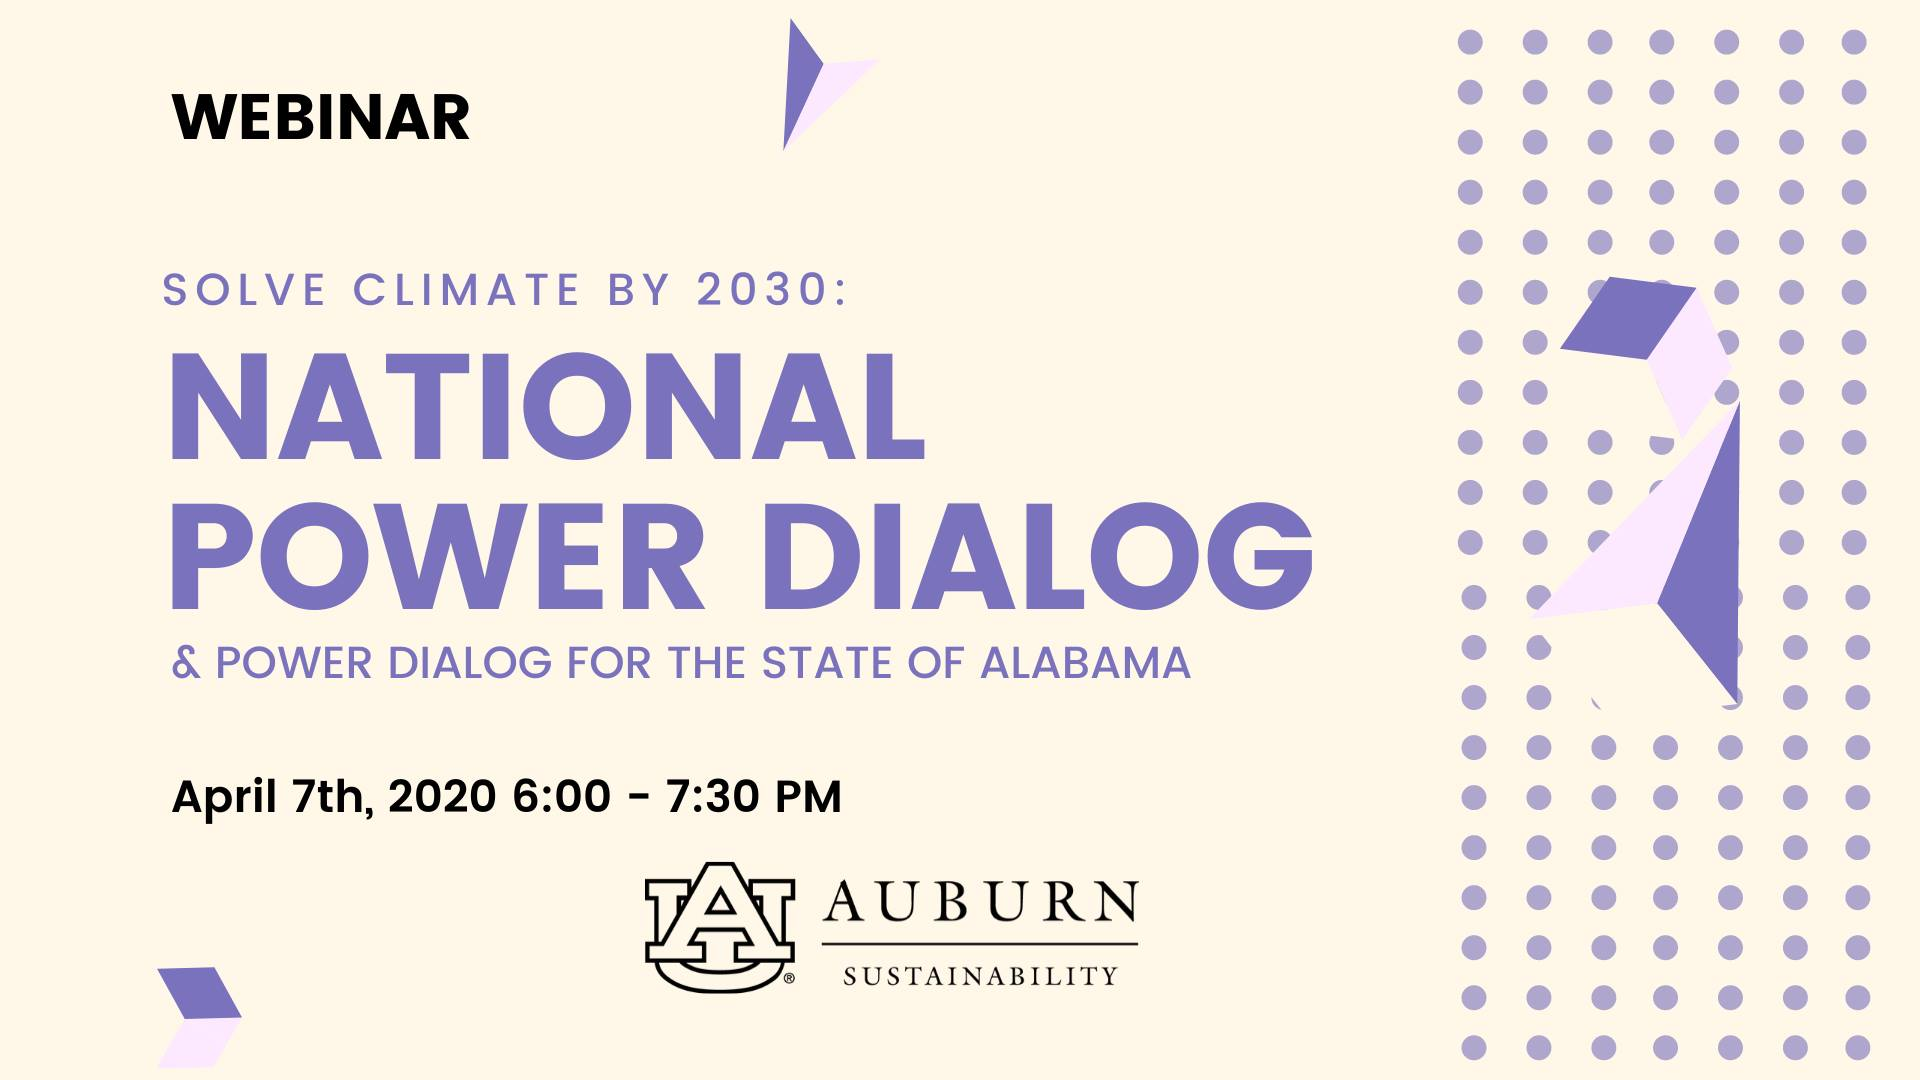 National Power Dialog